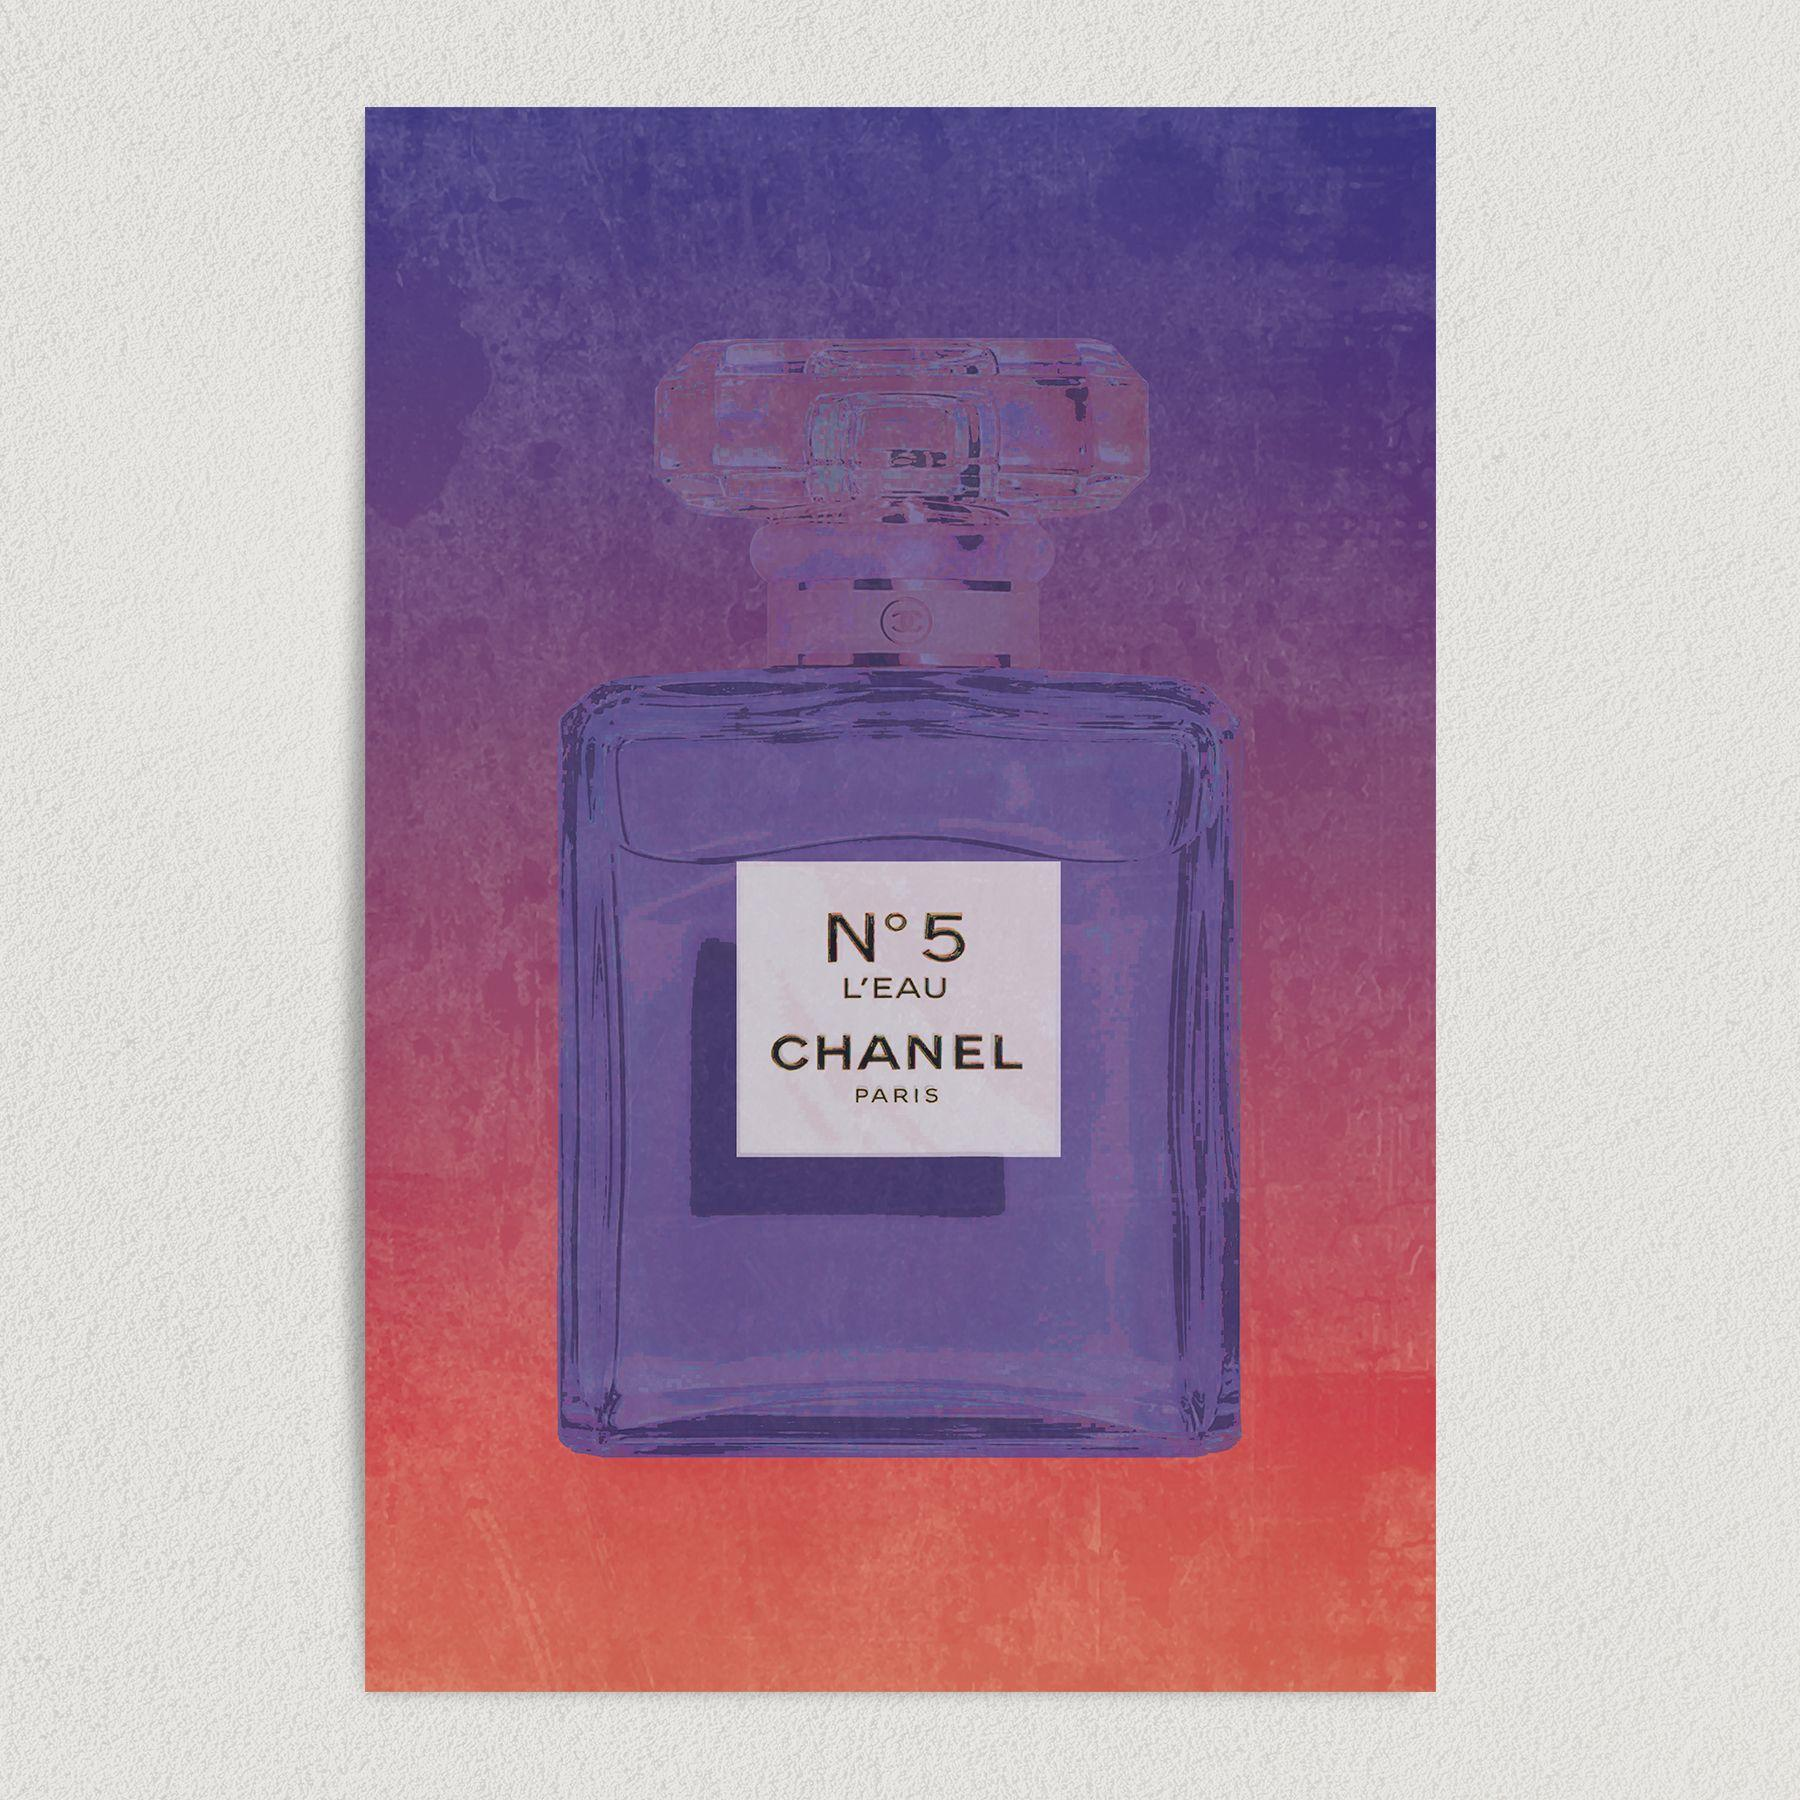 Chanel No5 Fragrance Art Print Poster 12″ x 18″ Wall Art BF1000